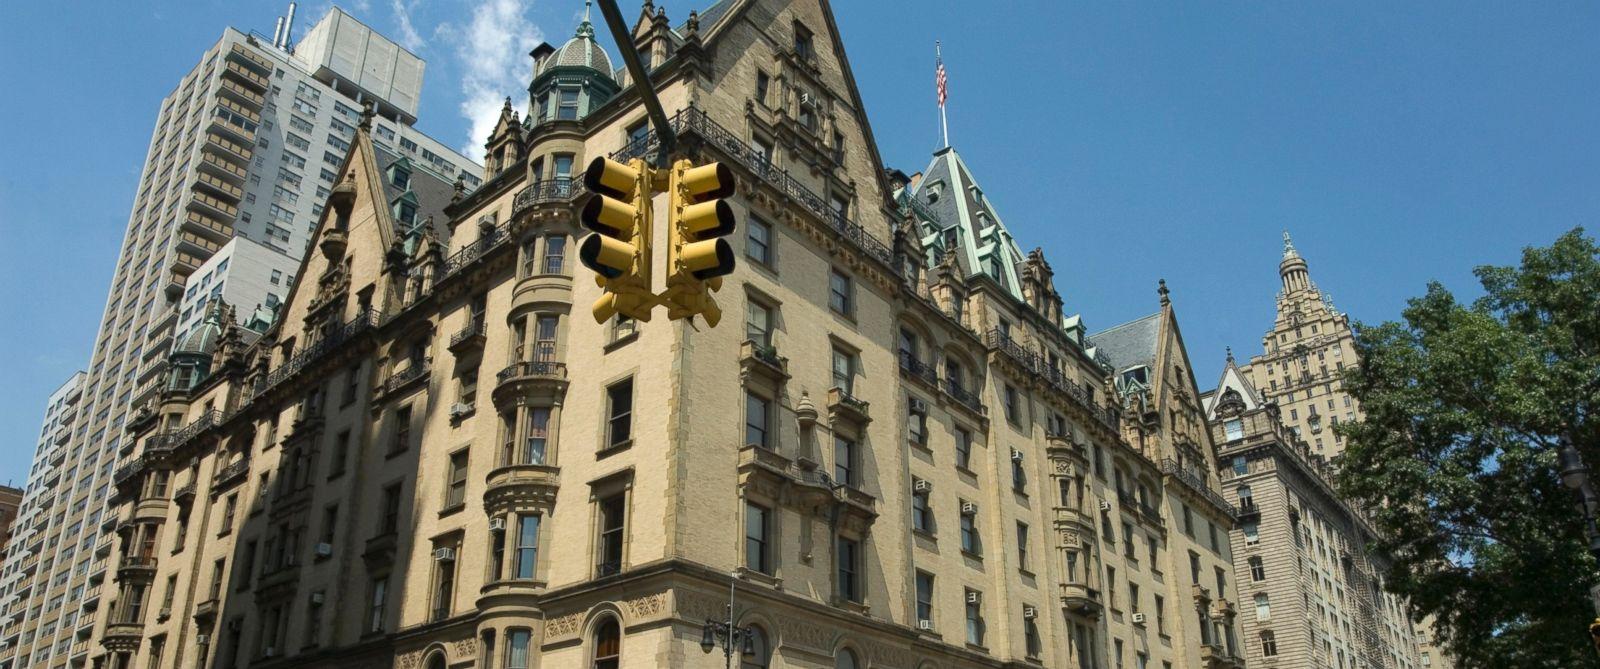 El edificio Dakota en Nueva York